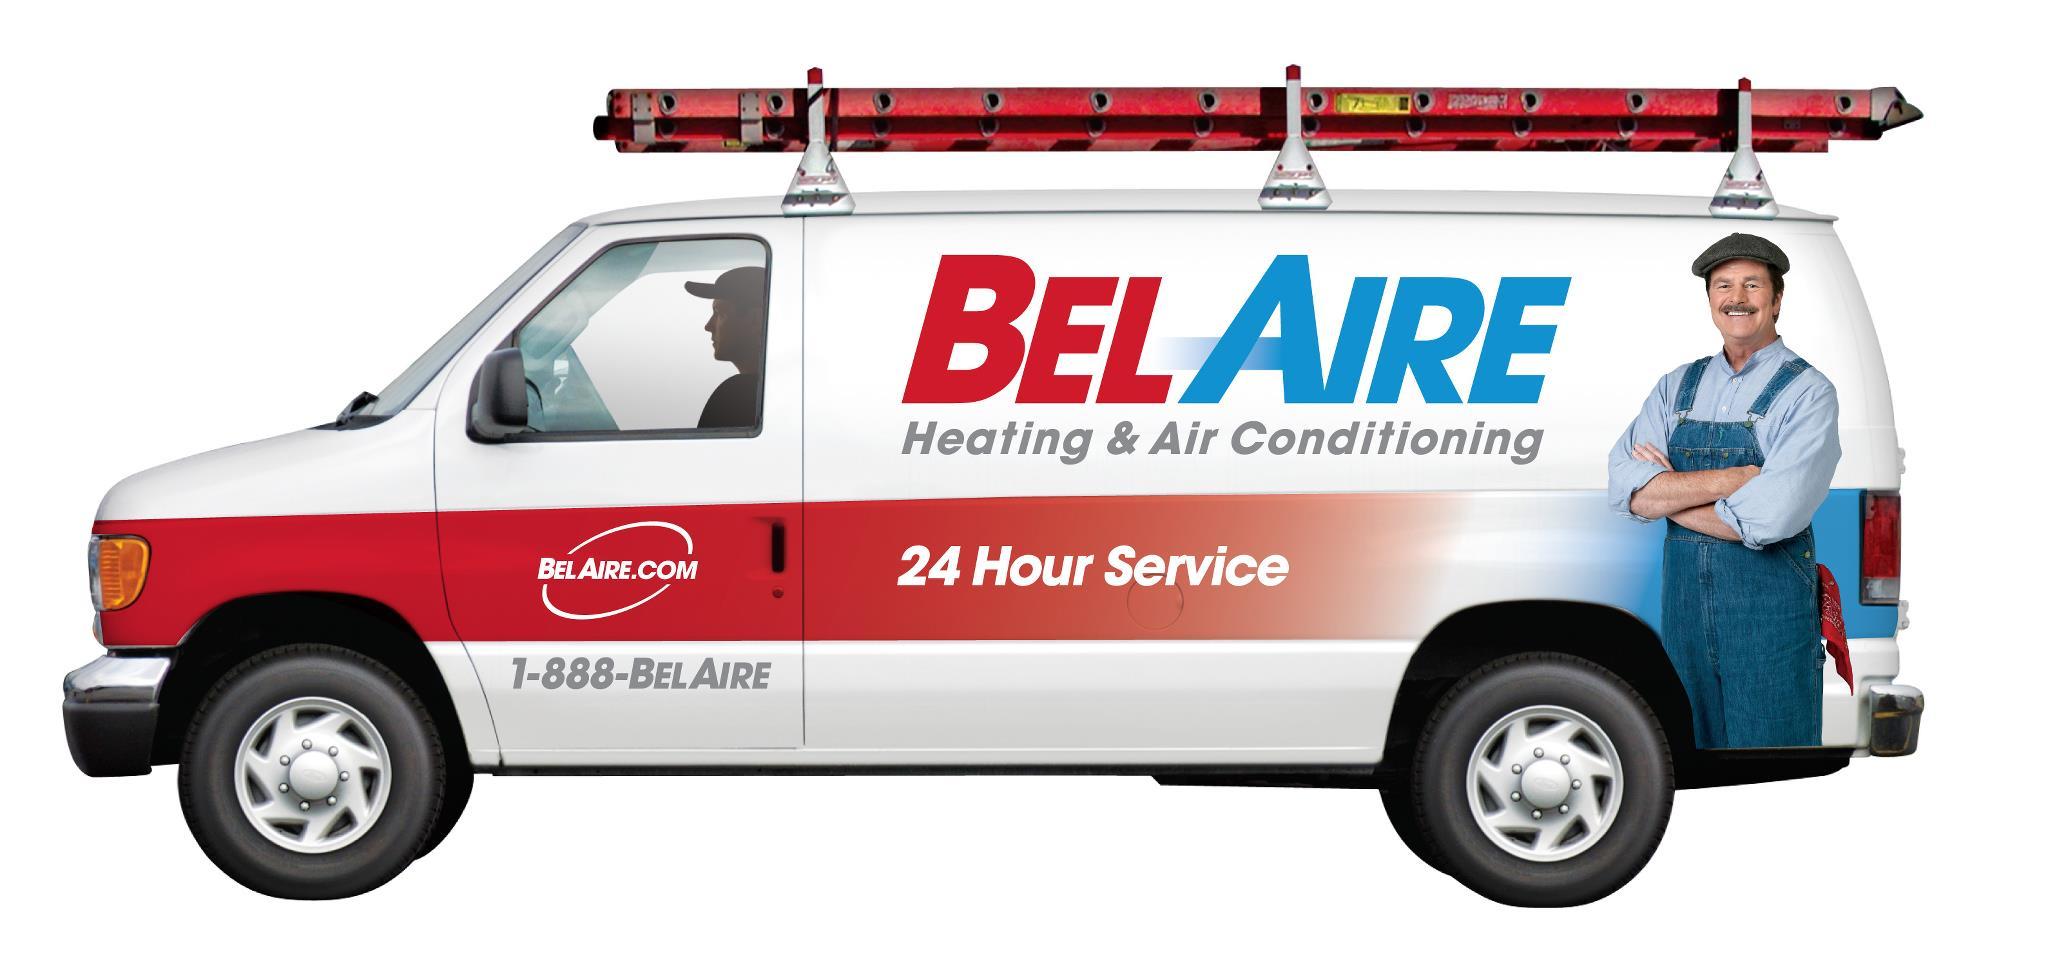 Bel Aire Heating A Creviews Portage Mi 49024 1 Through50